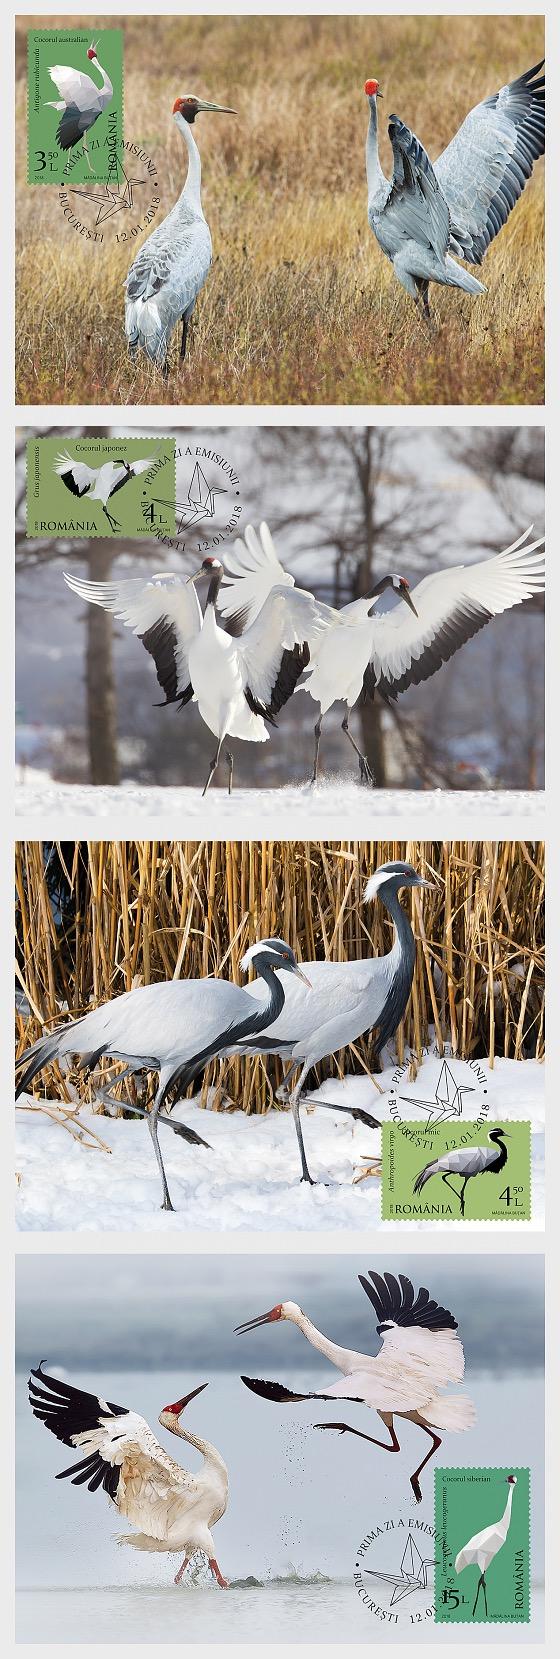 Migratory Birds - Cranes - Maxi Cards